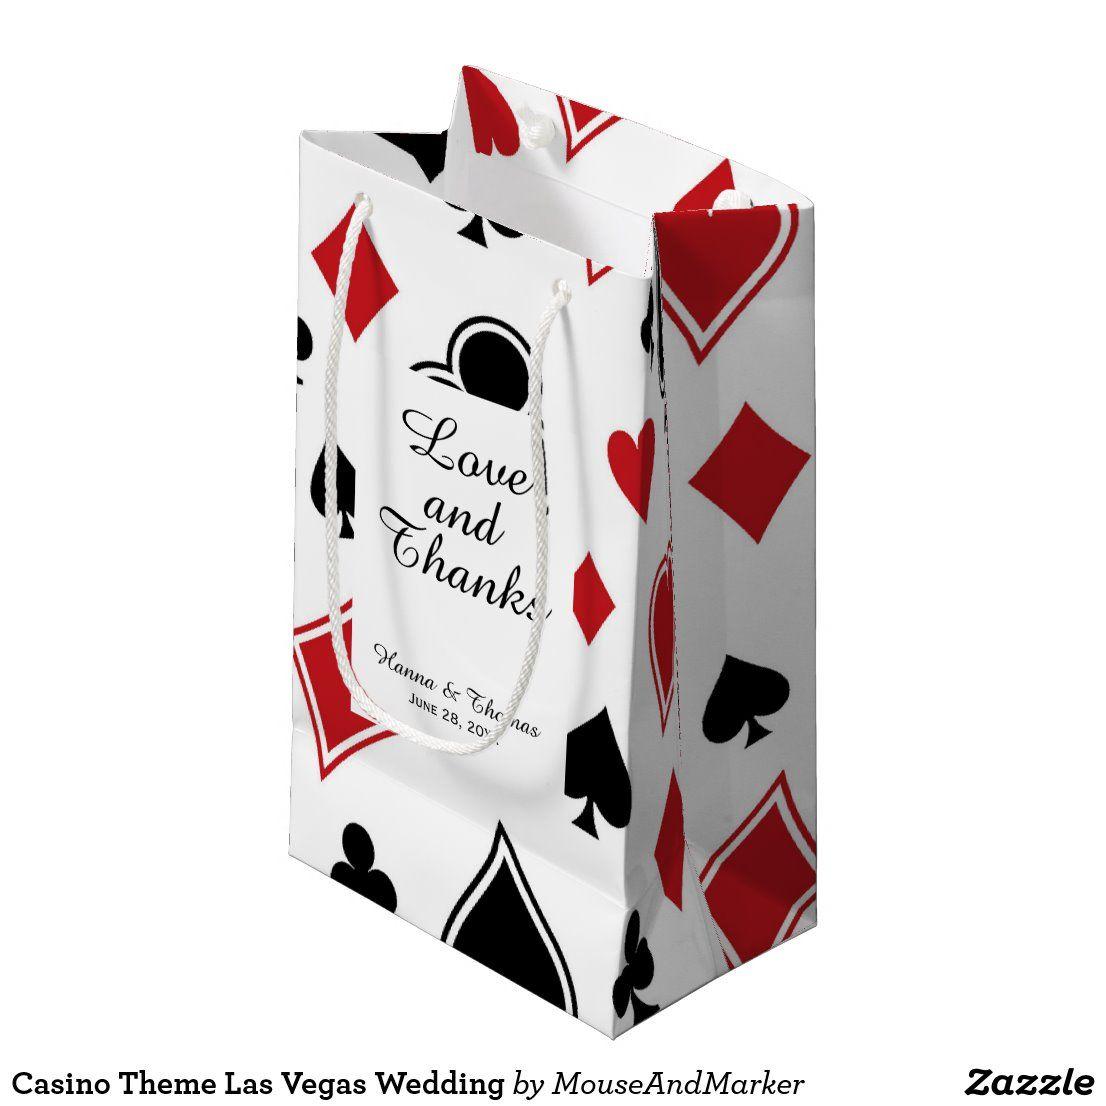 Casino Theme Las Vegas Wedding Small Gift Bag